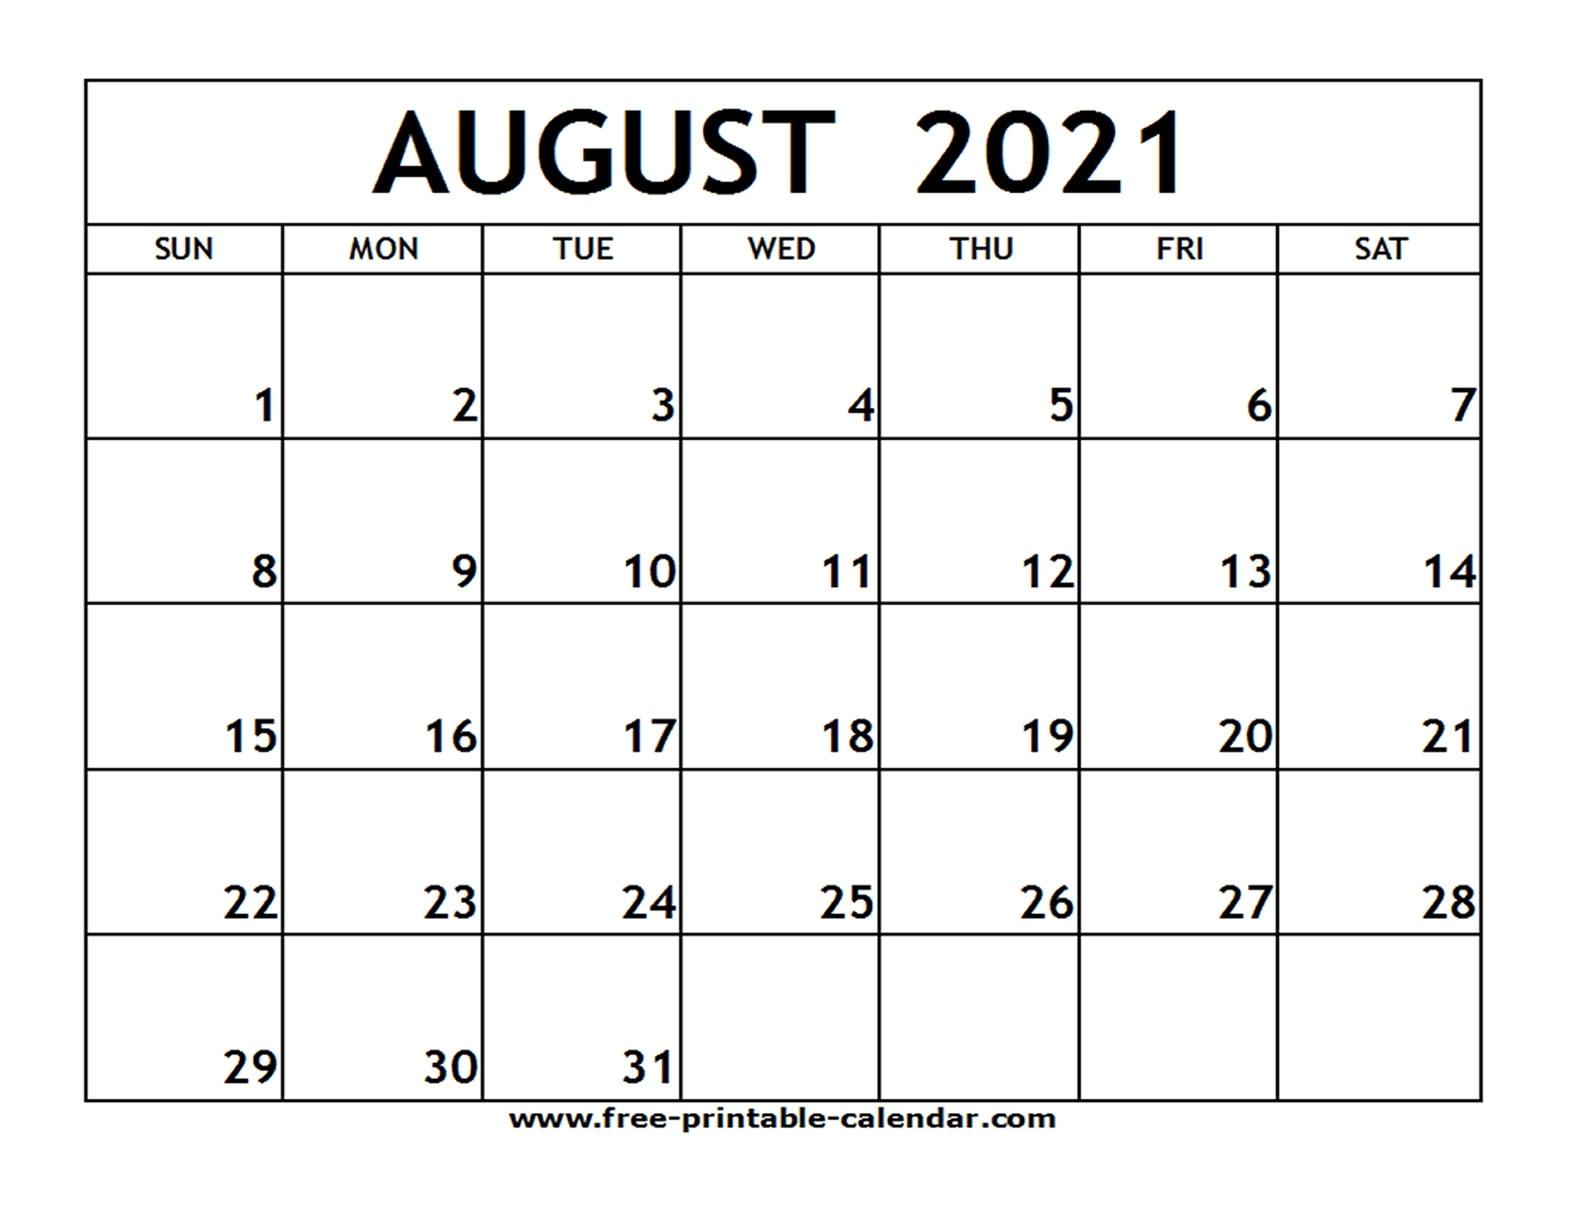 August 2021 Printable Calendar - Free-Printable-Calendar August 2021 Template Calendar